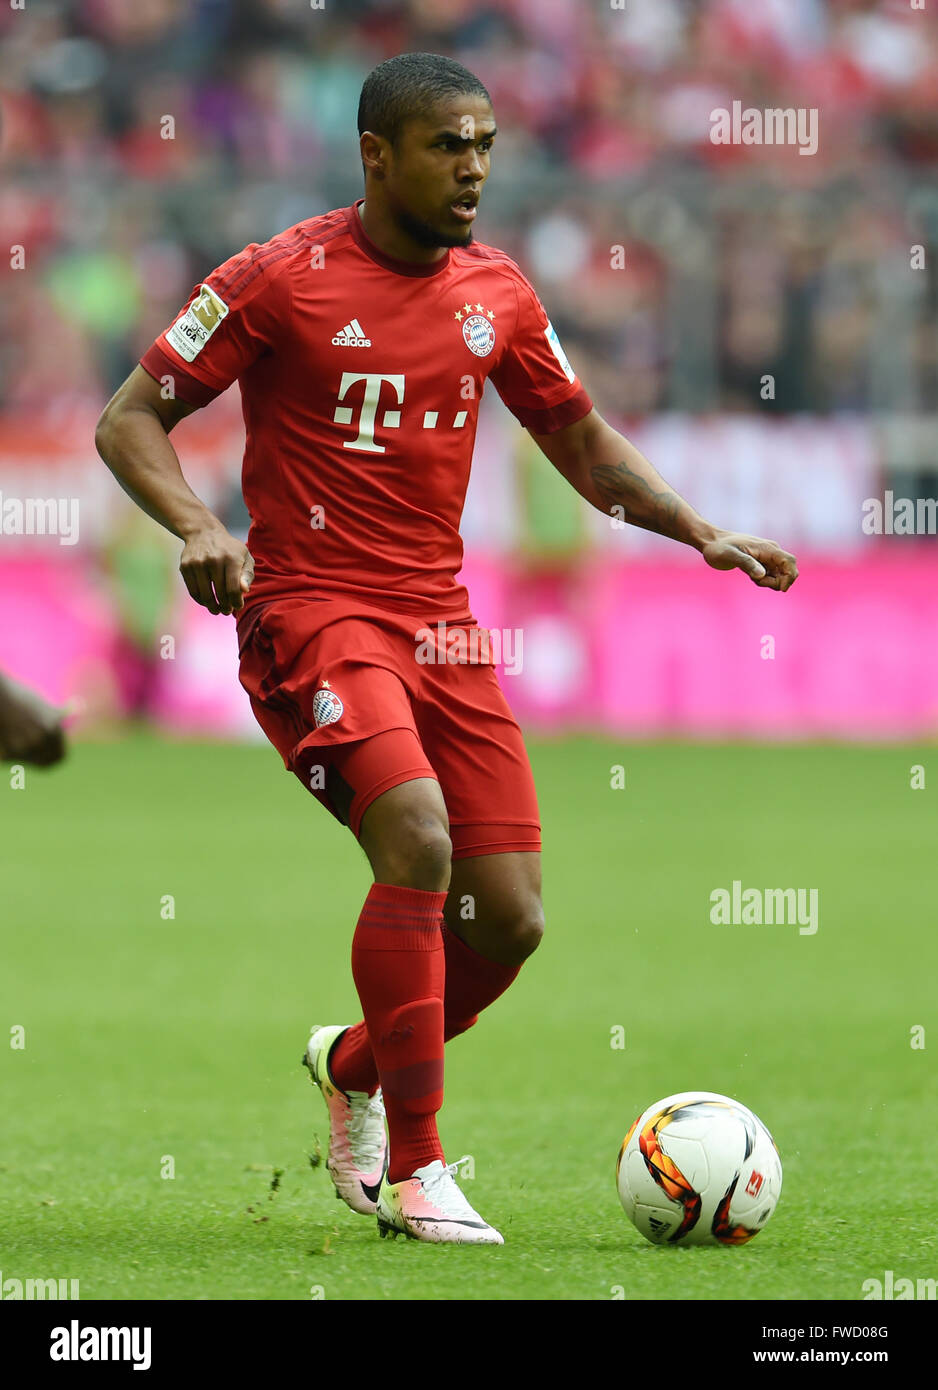 Munich Germany 2nd Apr 2016 Bayern Munich s Douglas Costa in